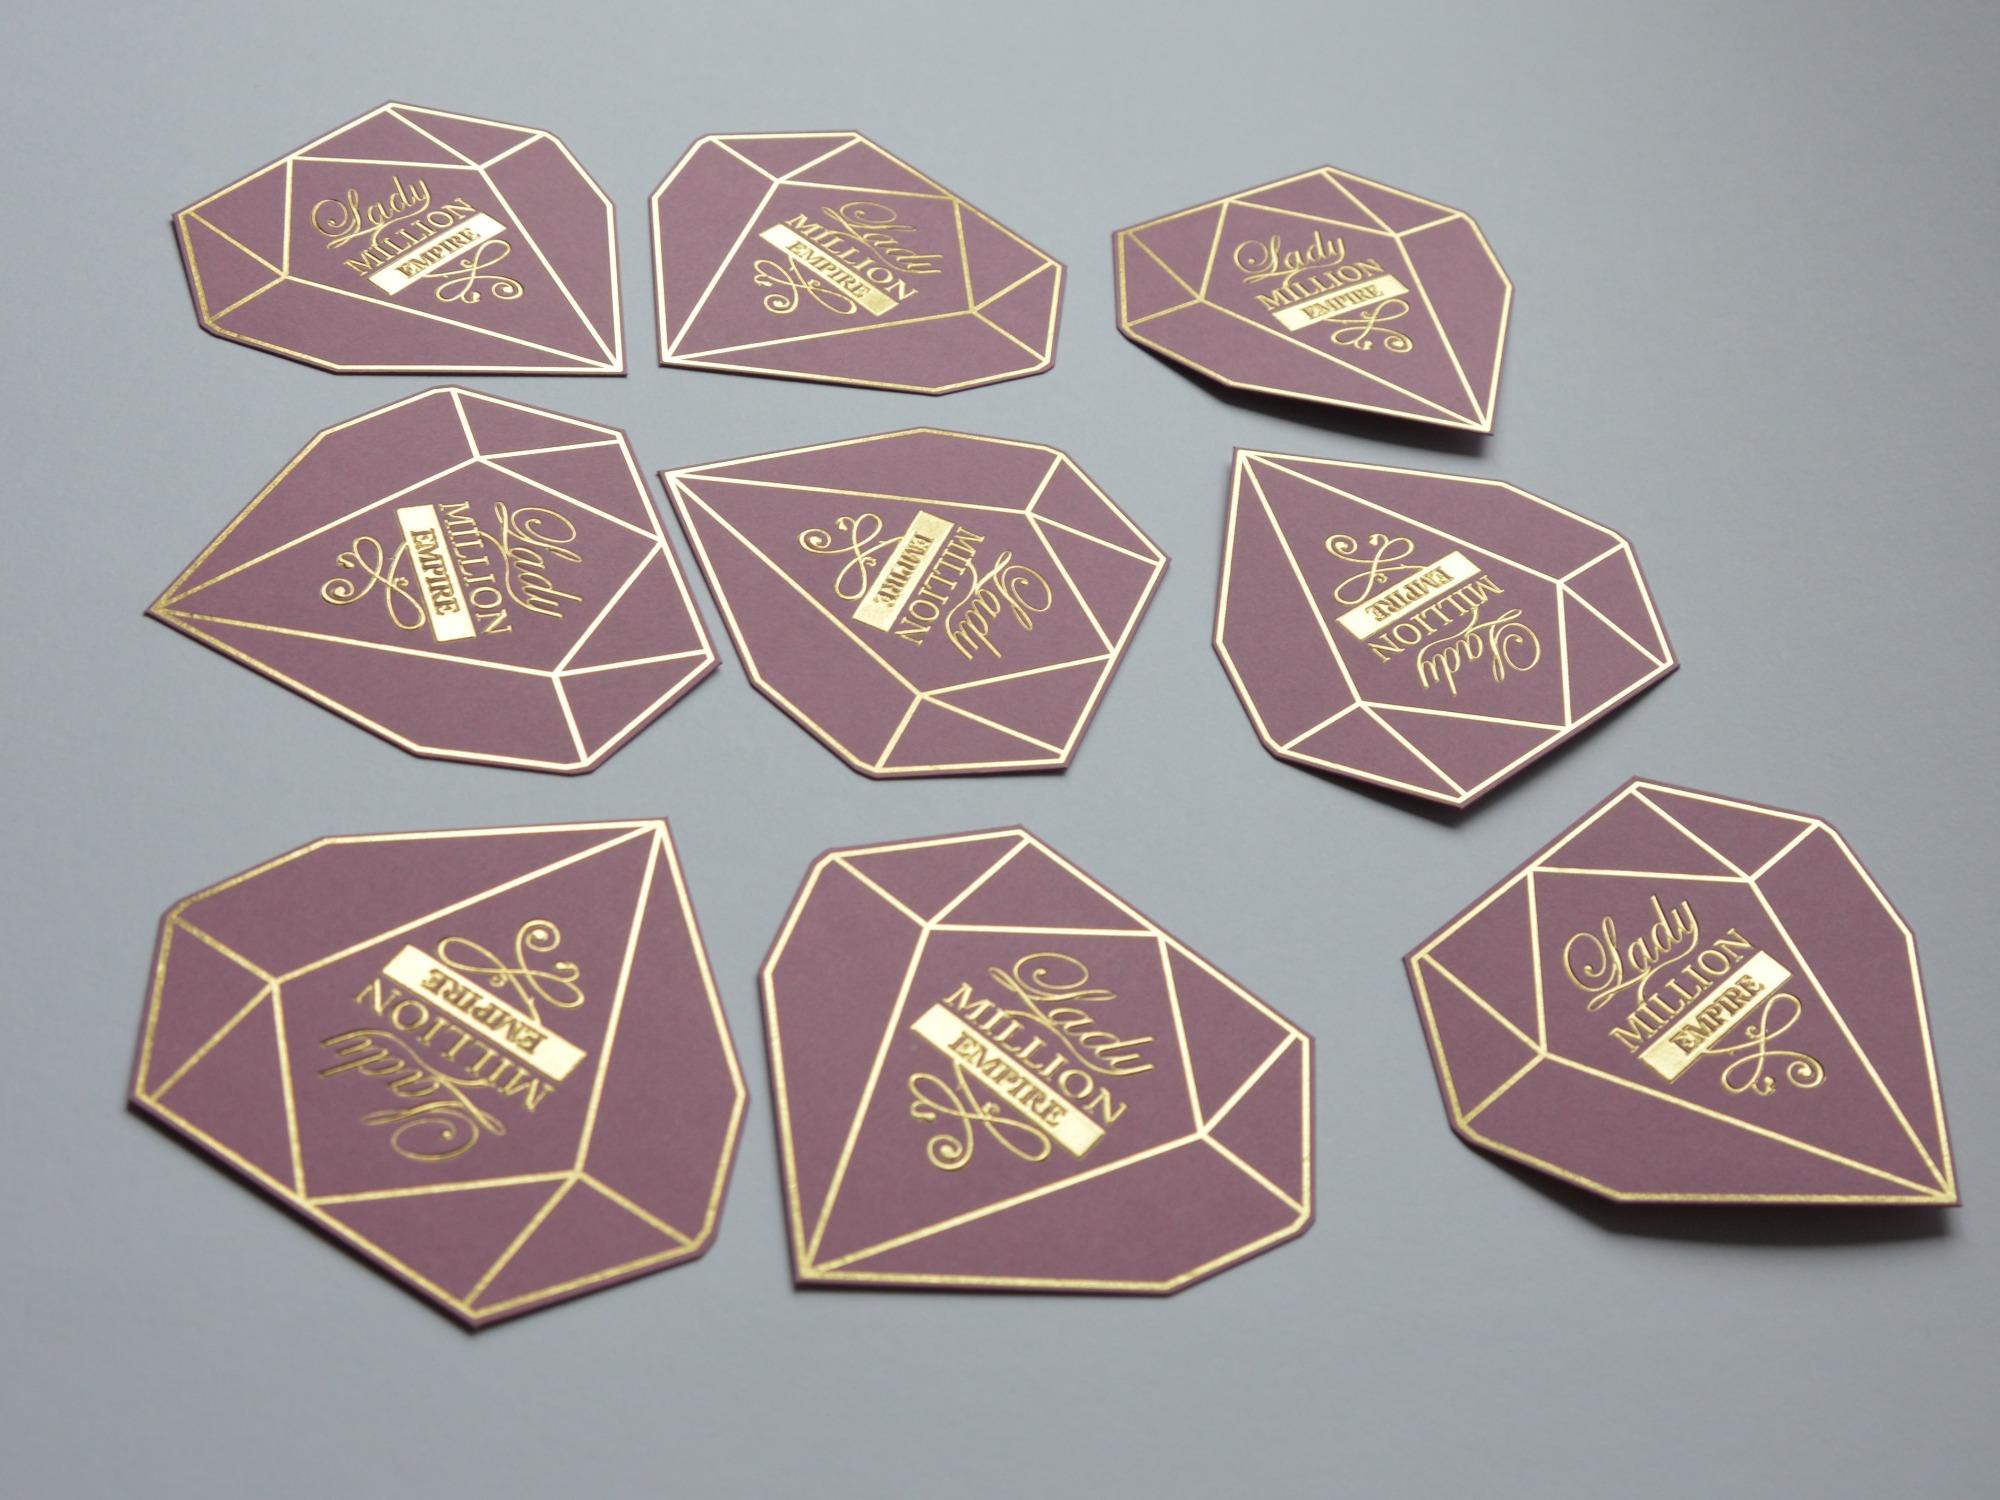 Blotters - Curvet hot-foil stamping